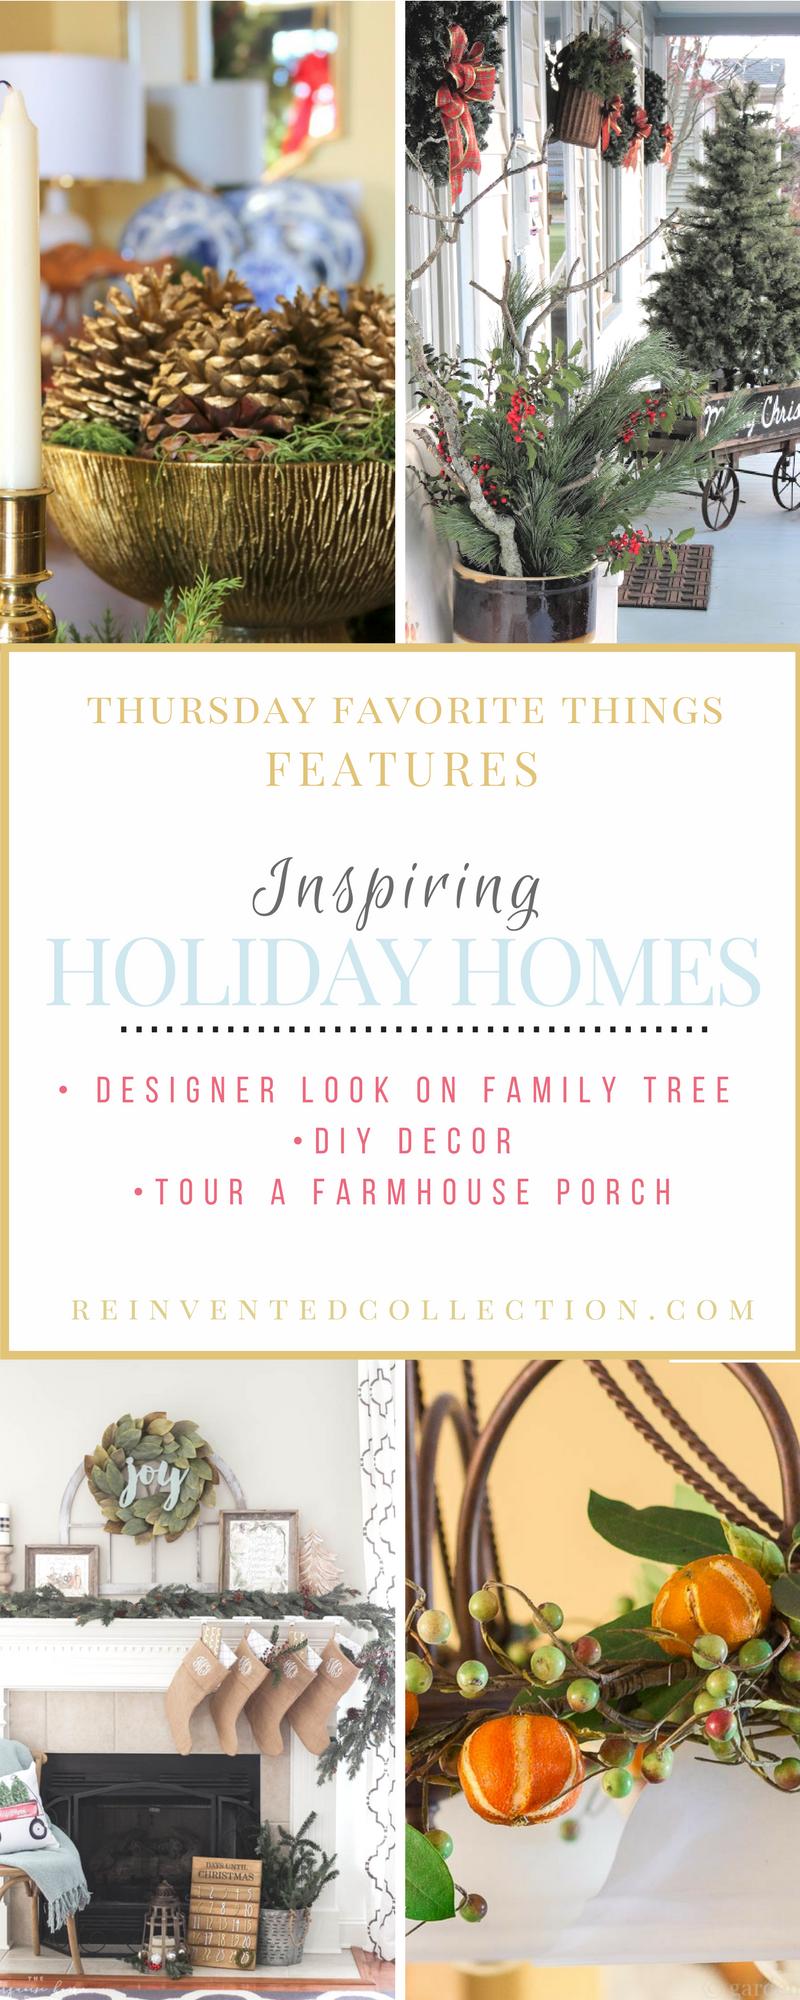 Fresh Christmas home decor ideas to create a designer look on a ...